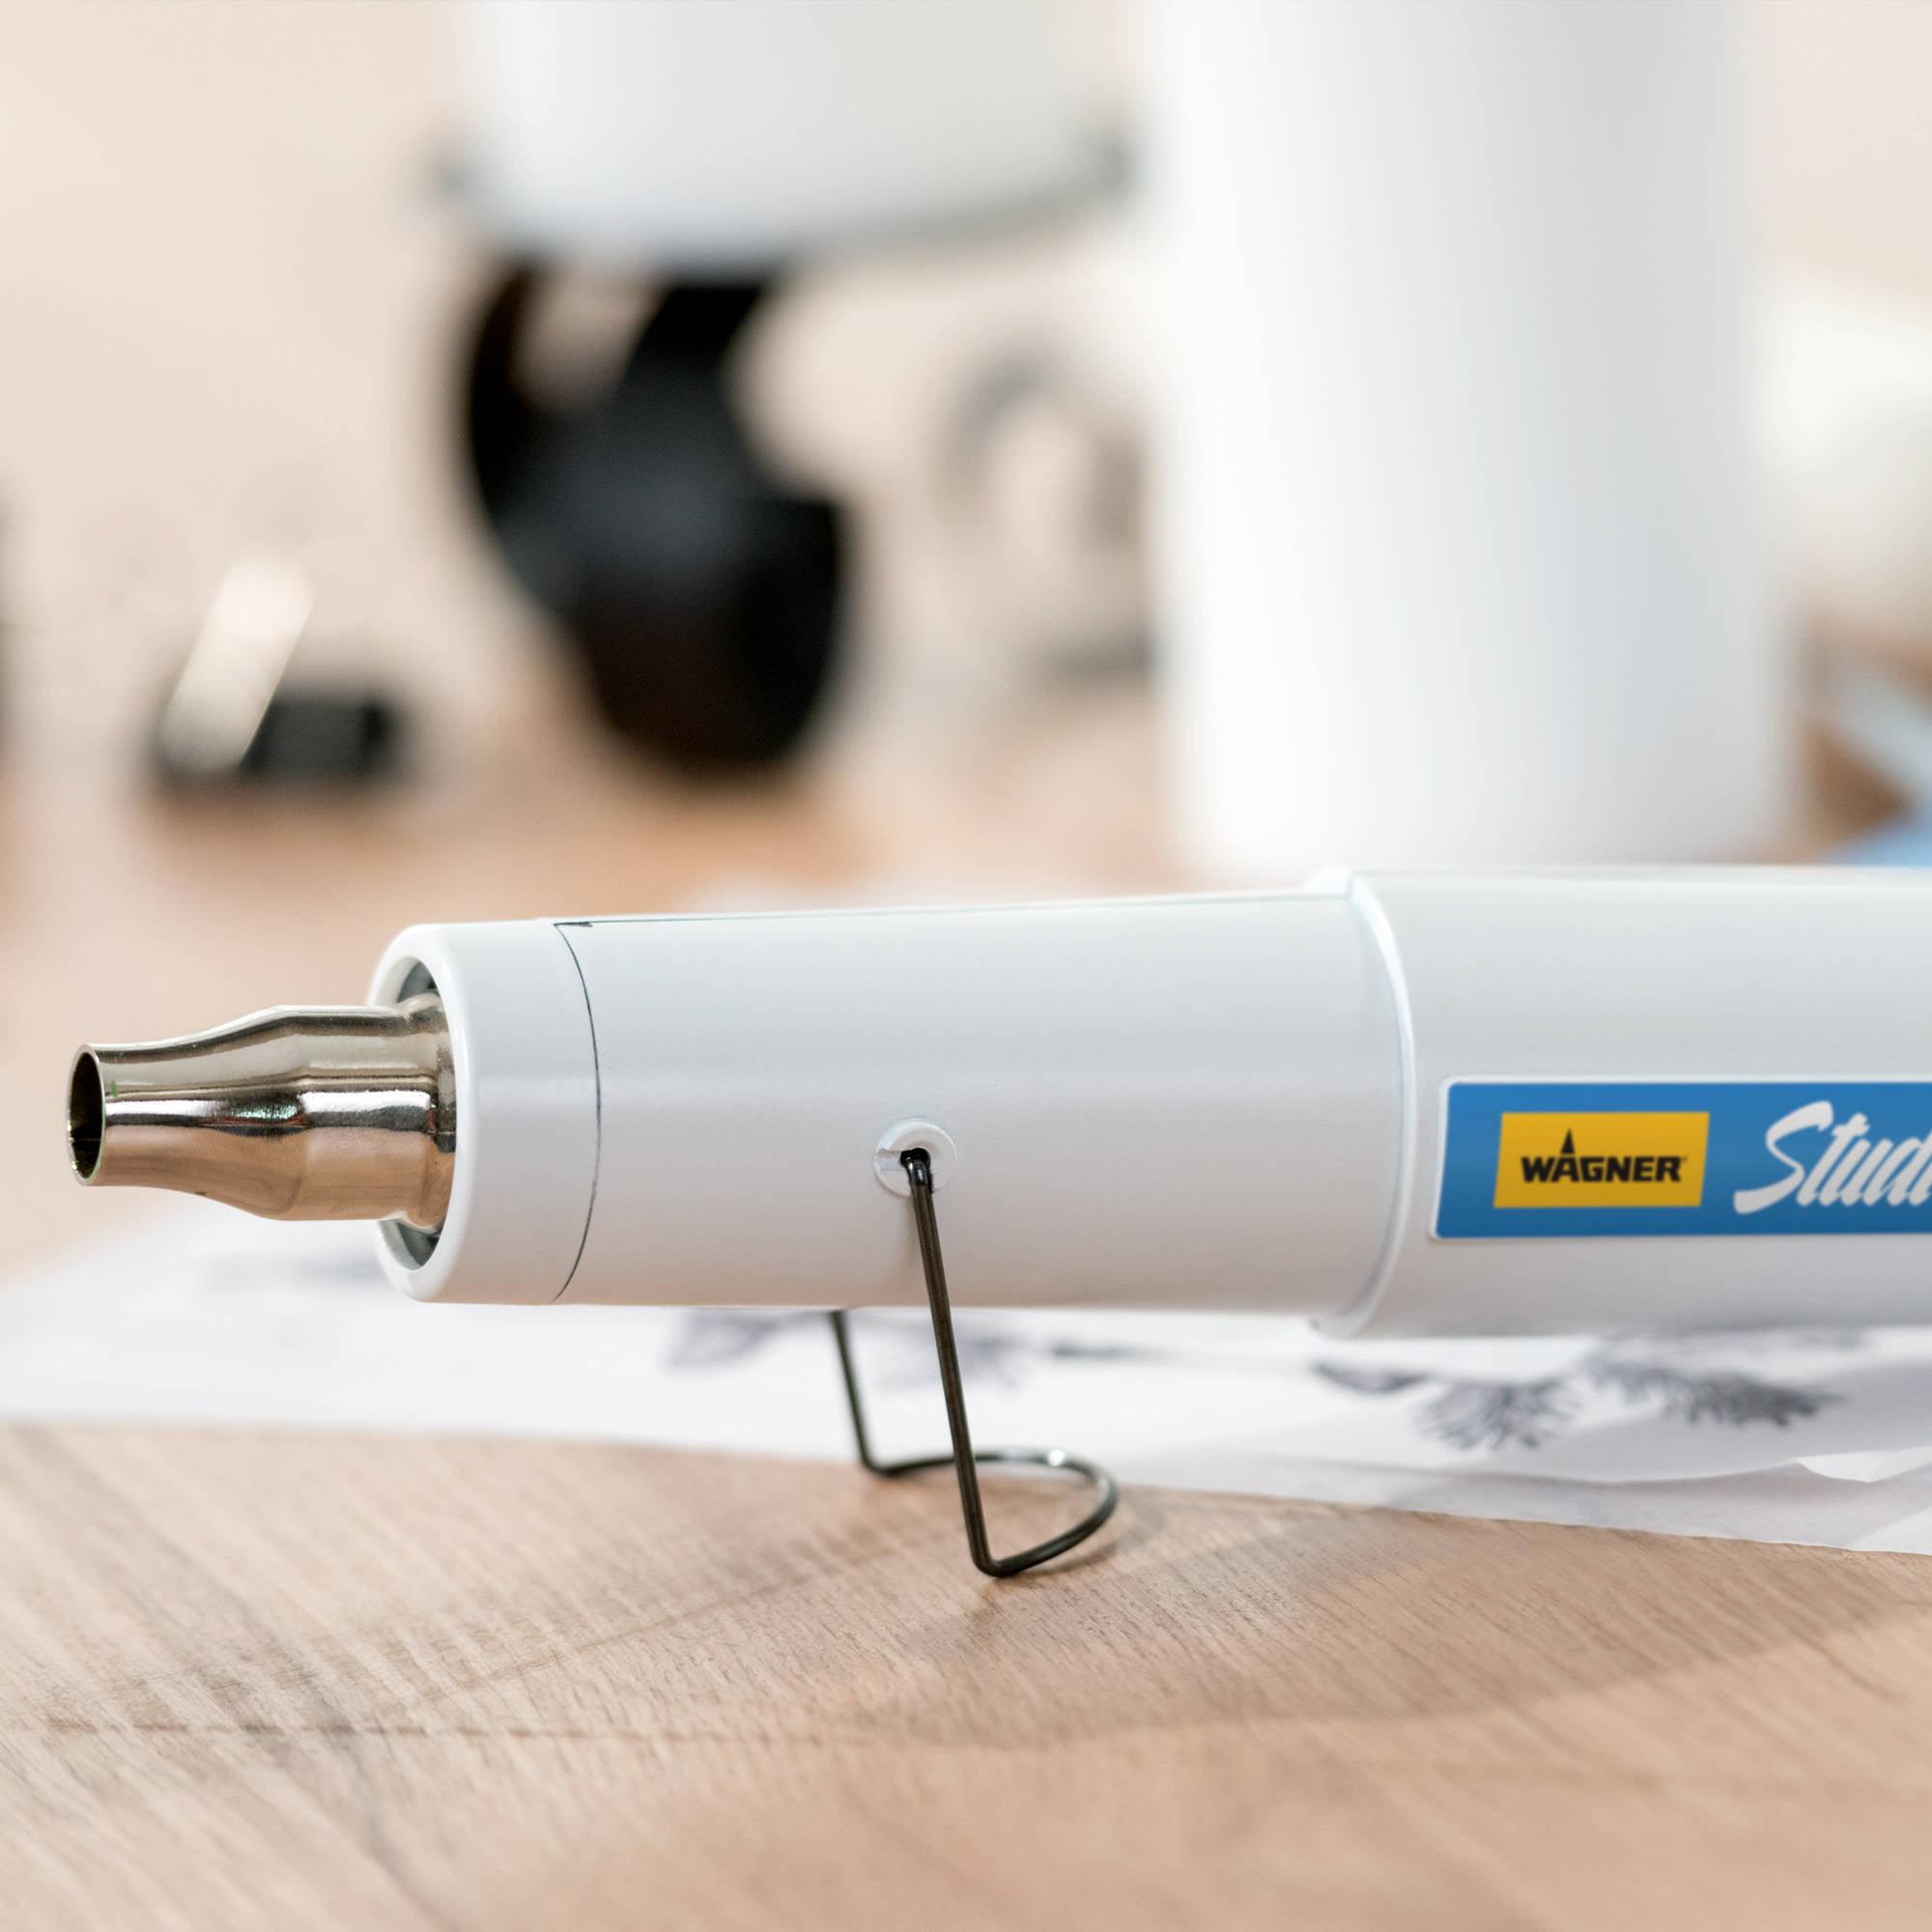 Wagner Studio Precision Heat Gun